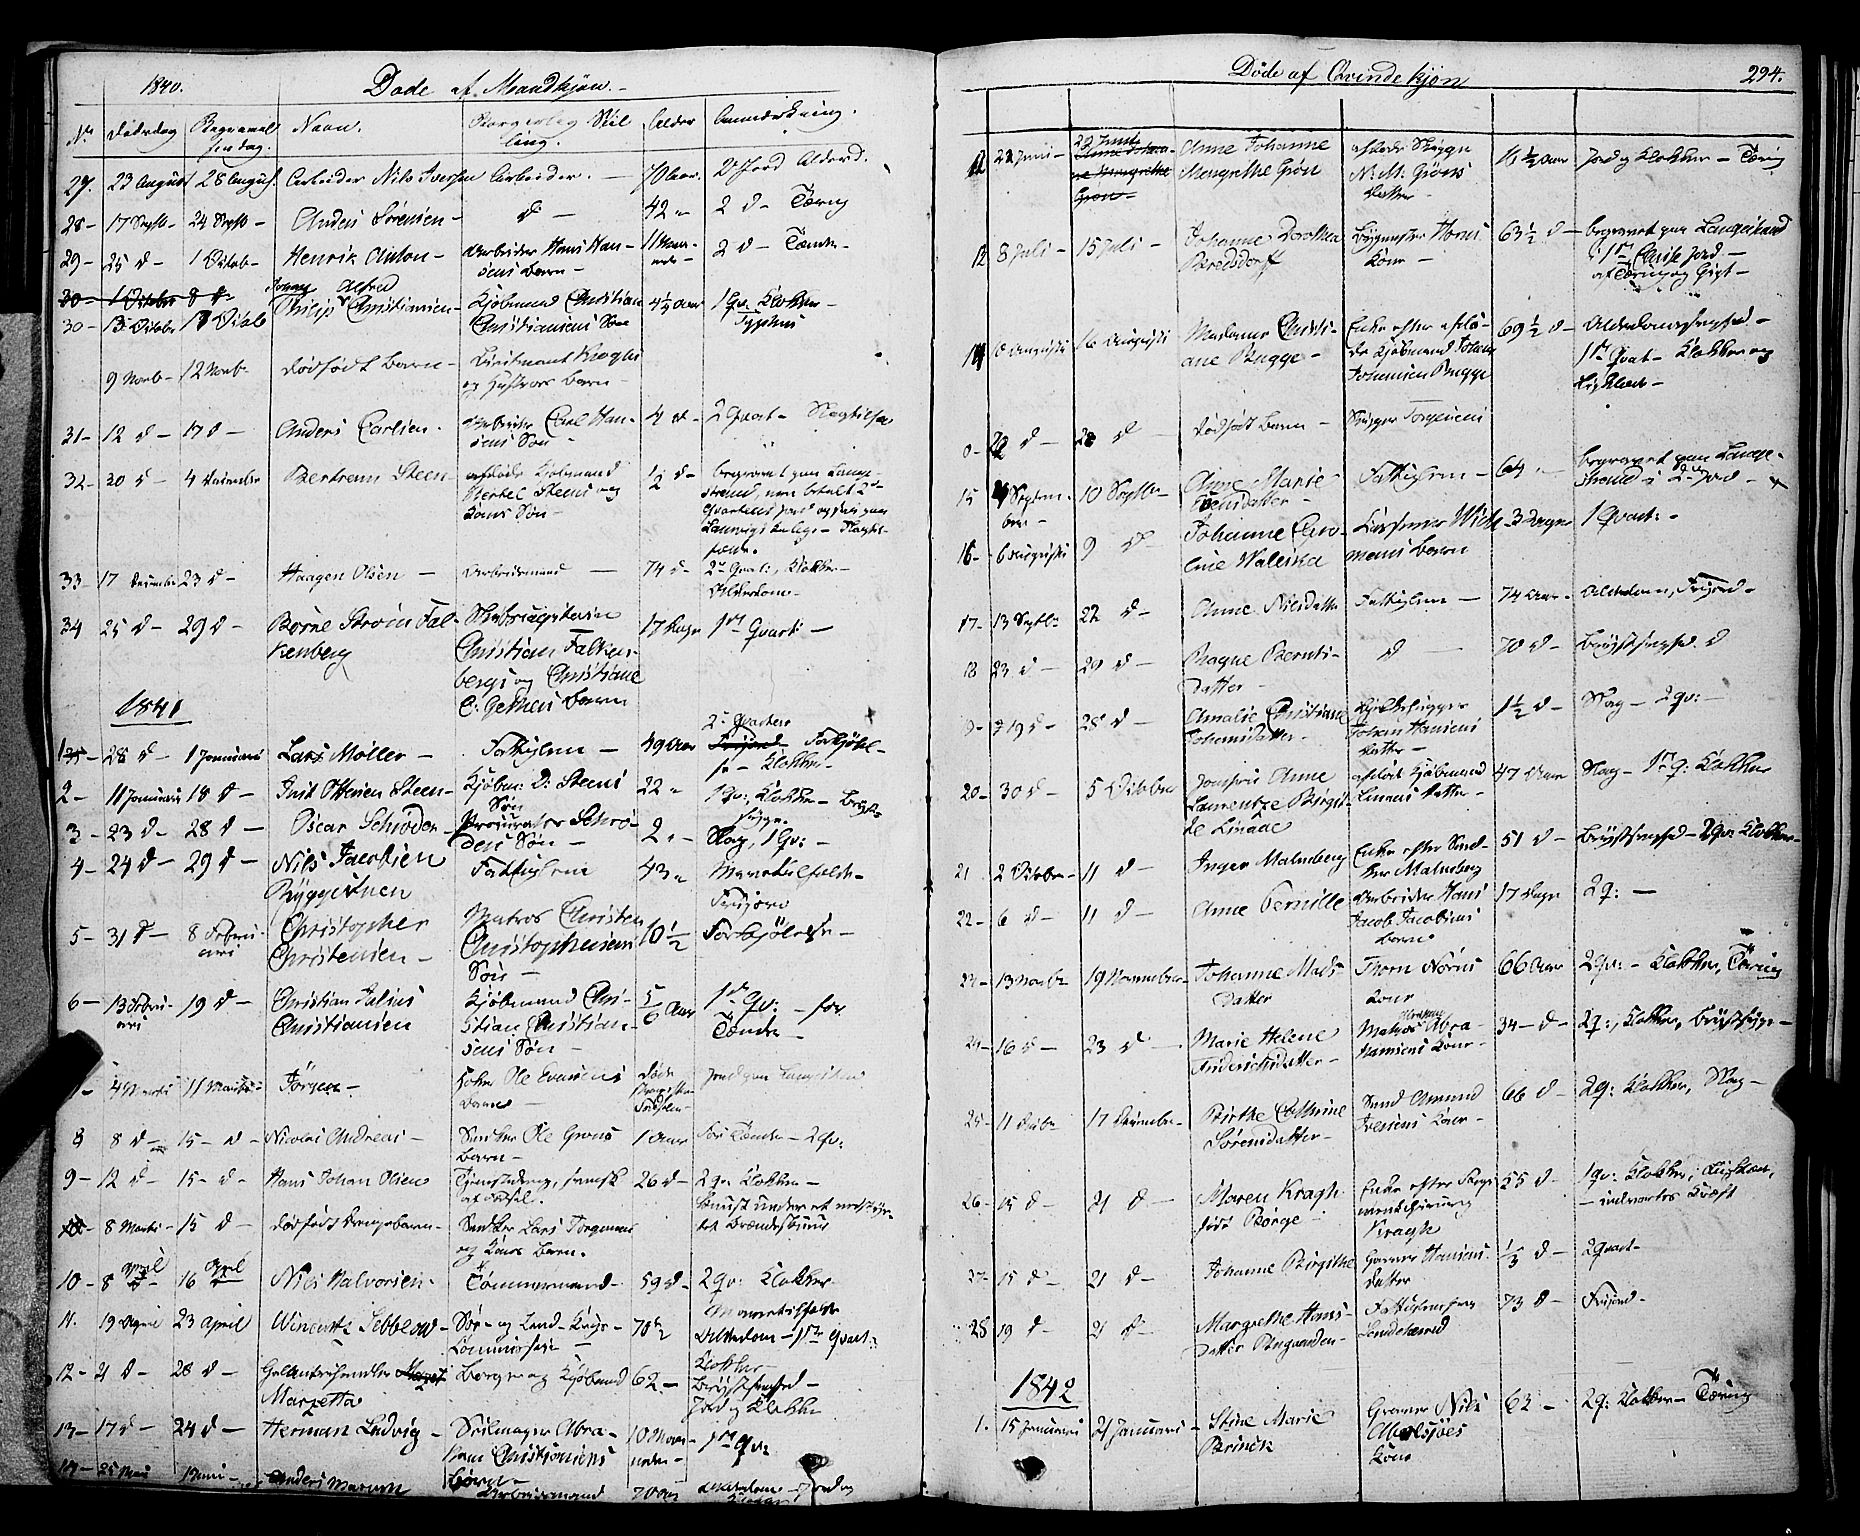 SAKO, Larvik kirkebøker, F/Fa/L0002: Ministerialbok nr. I 2, 1825-1847, s. 294